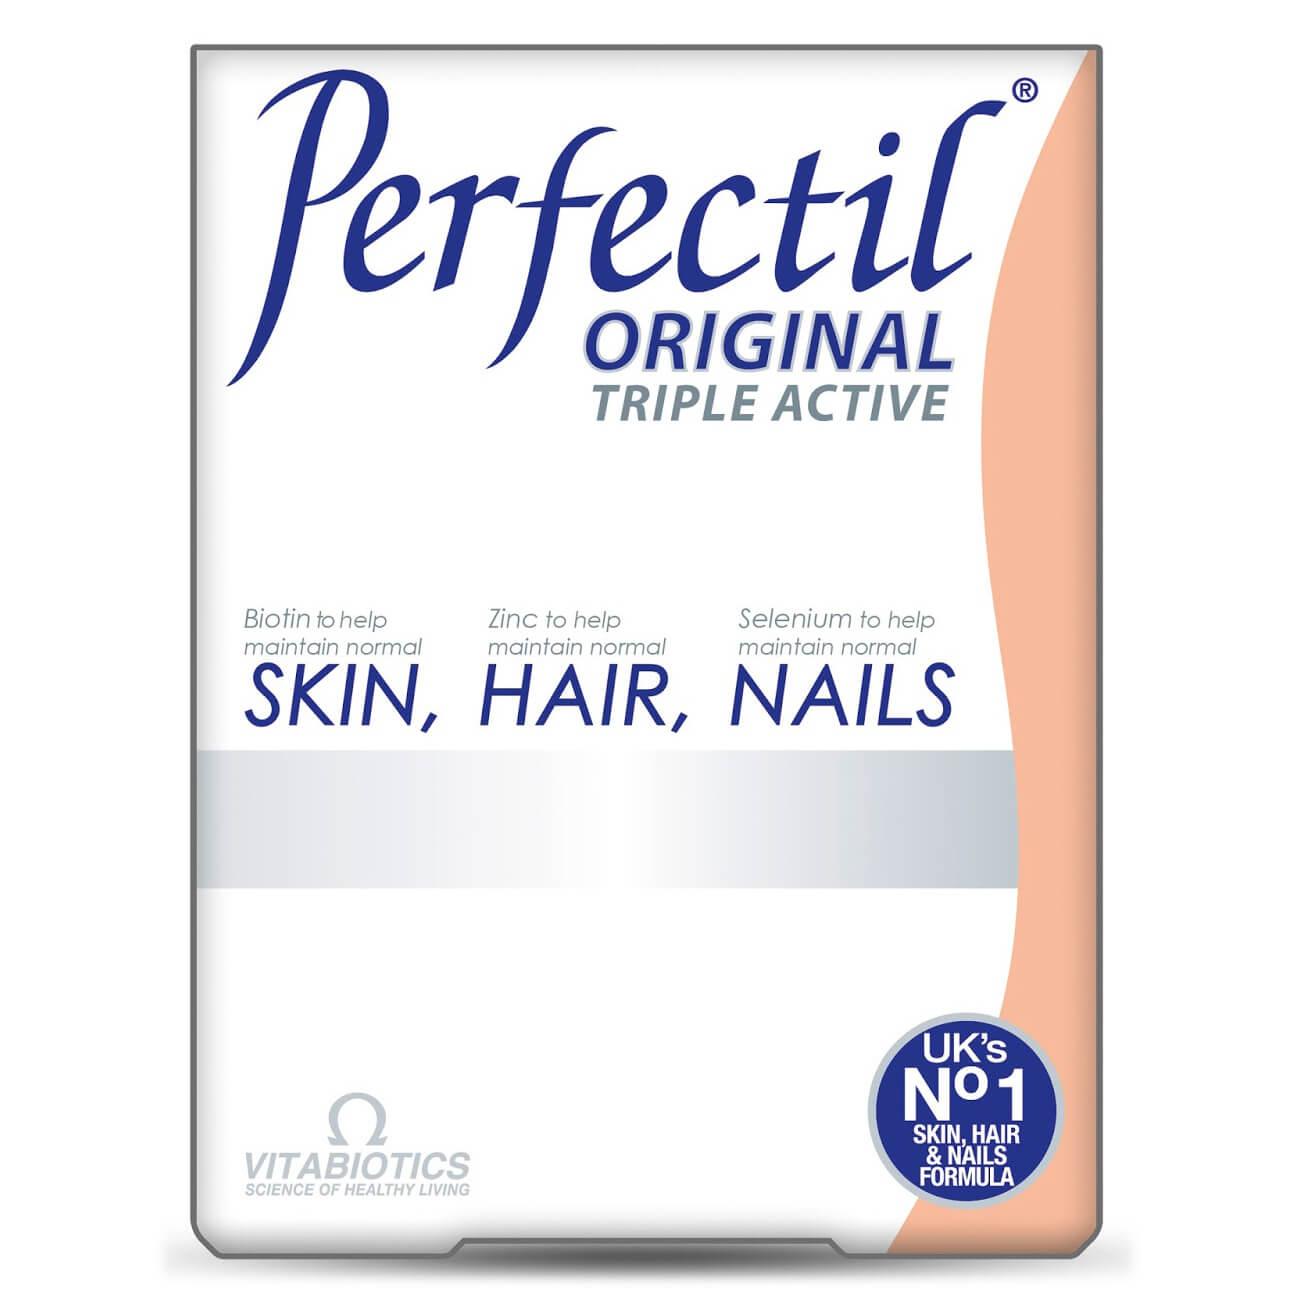 Vitabiotics Perfectil Original Συμπλήρωμα Διατροφής για Υγεία του Δέρματος των Μαλλιών και των Νυχιών 30 tabs